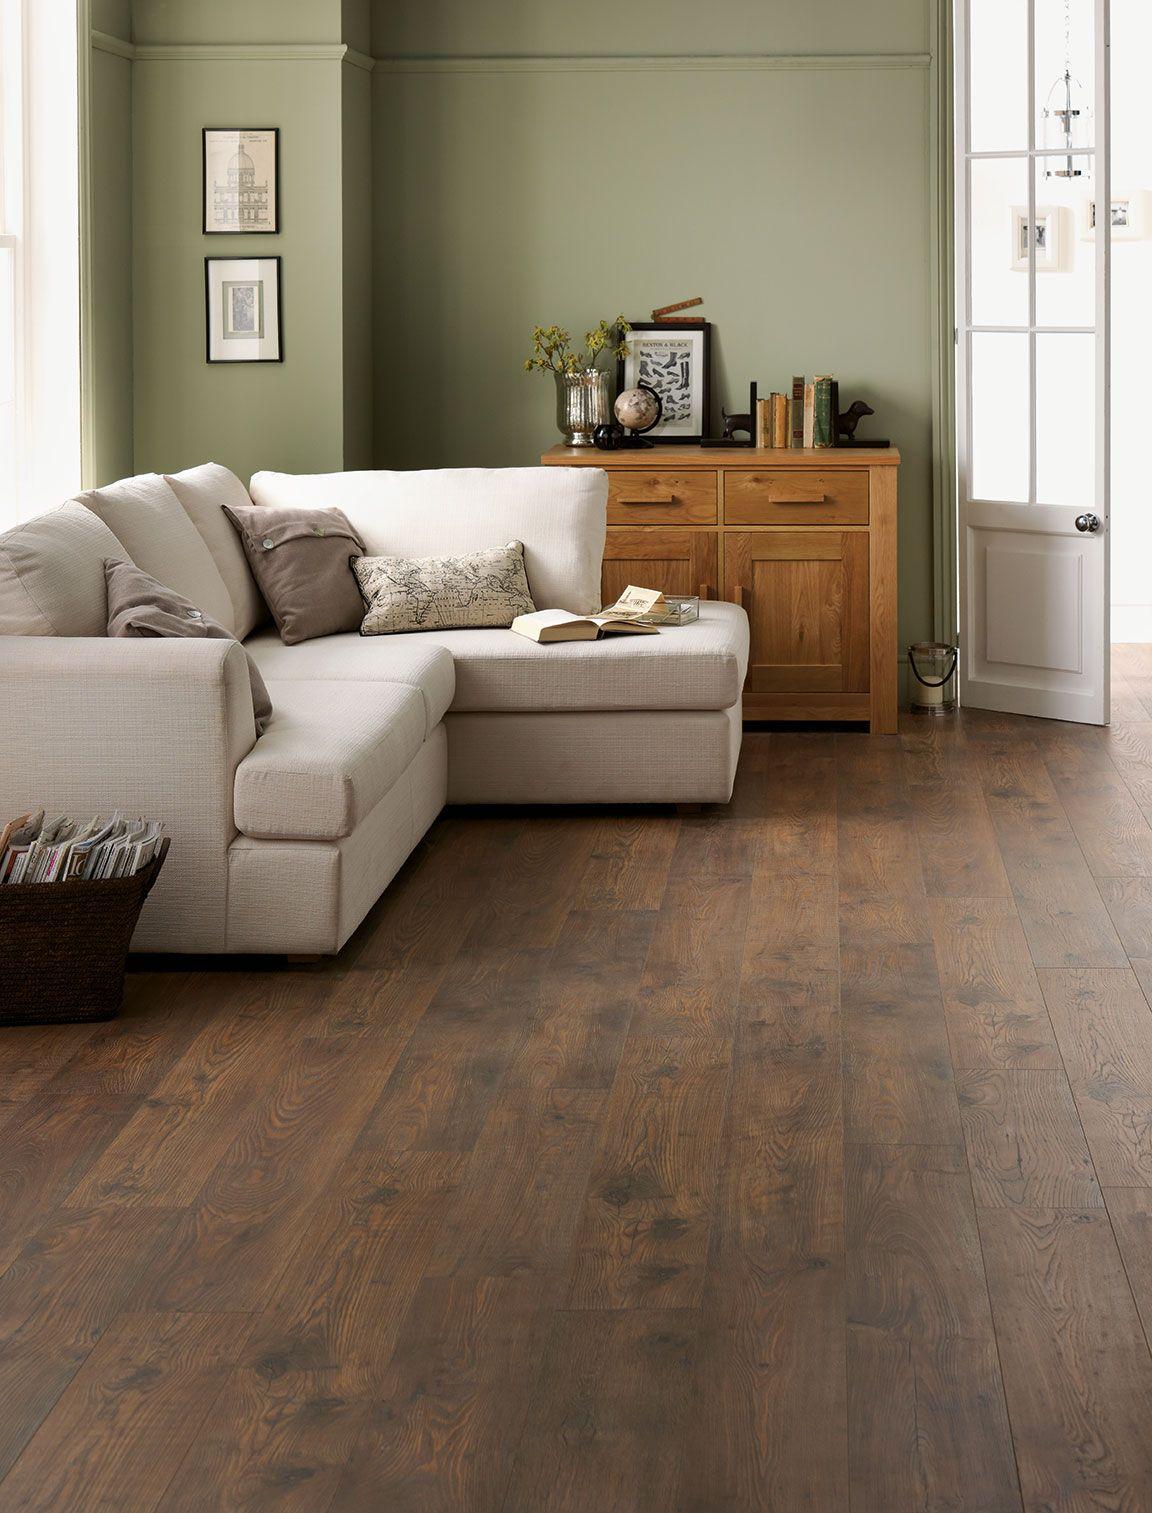 Schreiber Bedroom Furniture Eurohome Bakersfield Chestnut Laminate Flooring Laminate